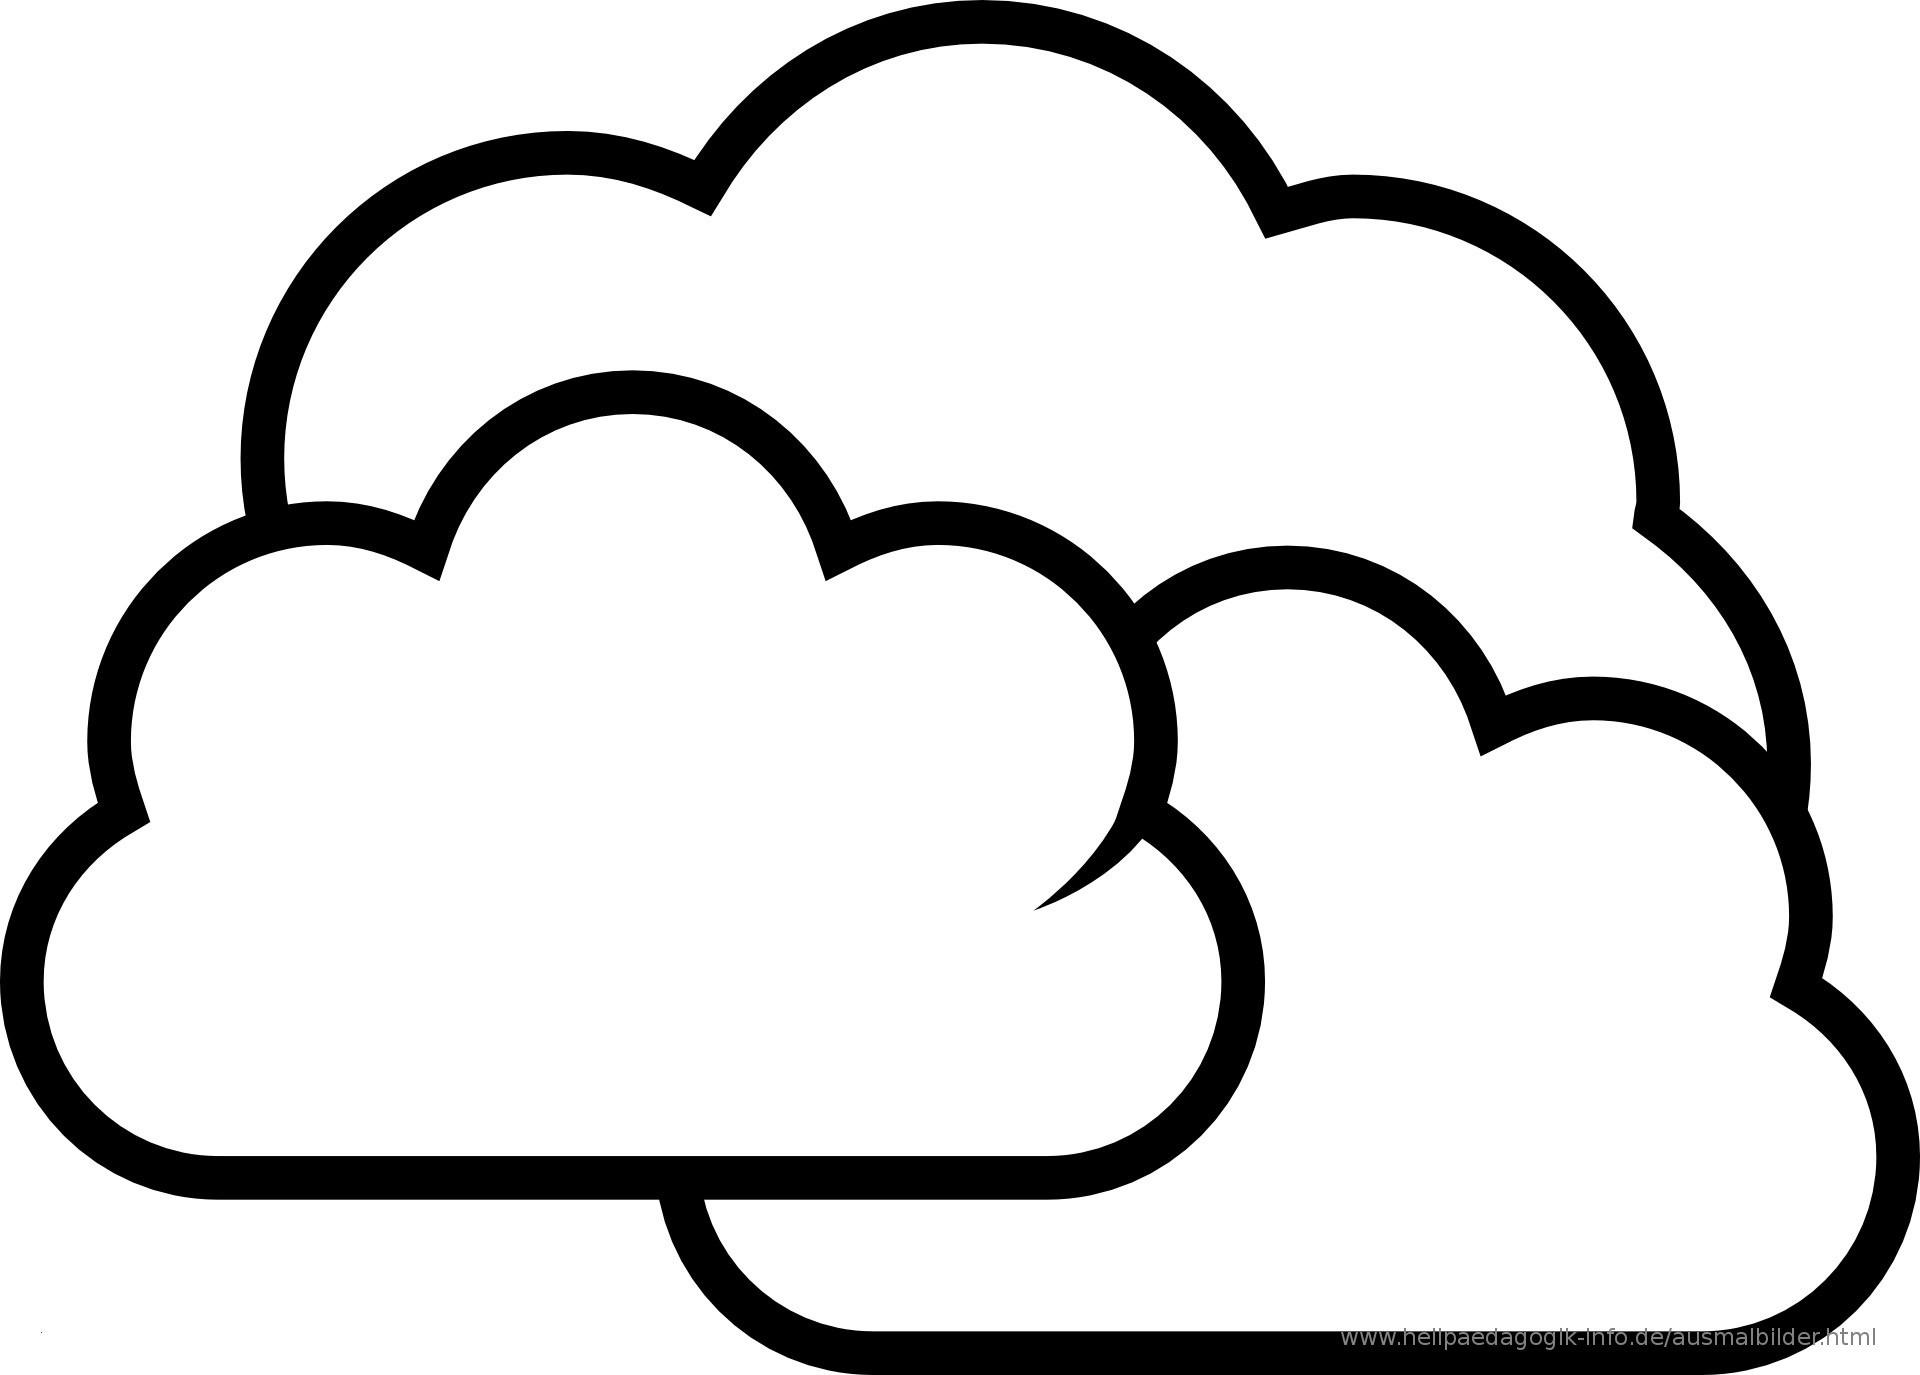 Coole Ausmalbilder Graffiti Frisch 35 Ausmalbilder Wolken Scoredatscore Elegant Coole Ausmalbilder Bild